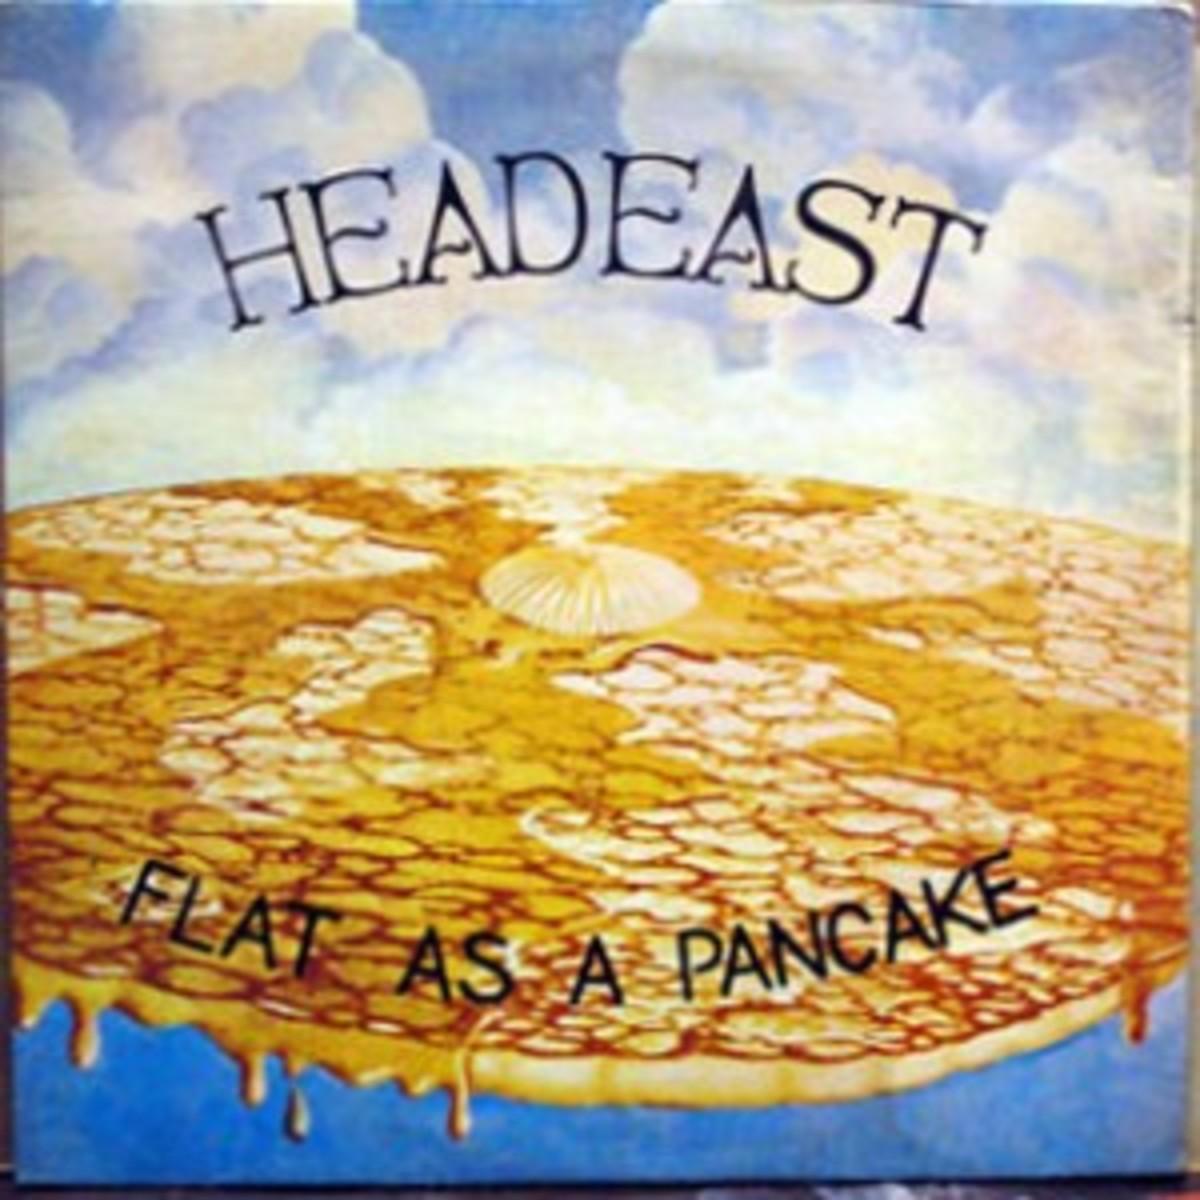 Head East Flat As A Pancake original LP